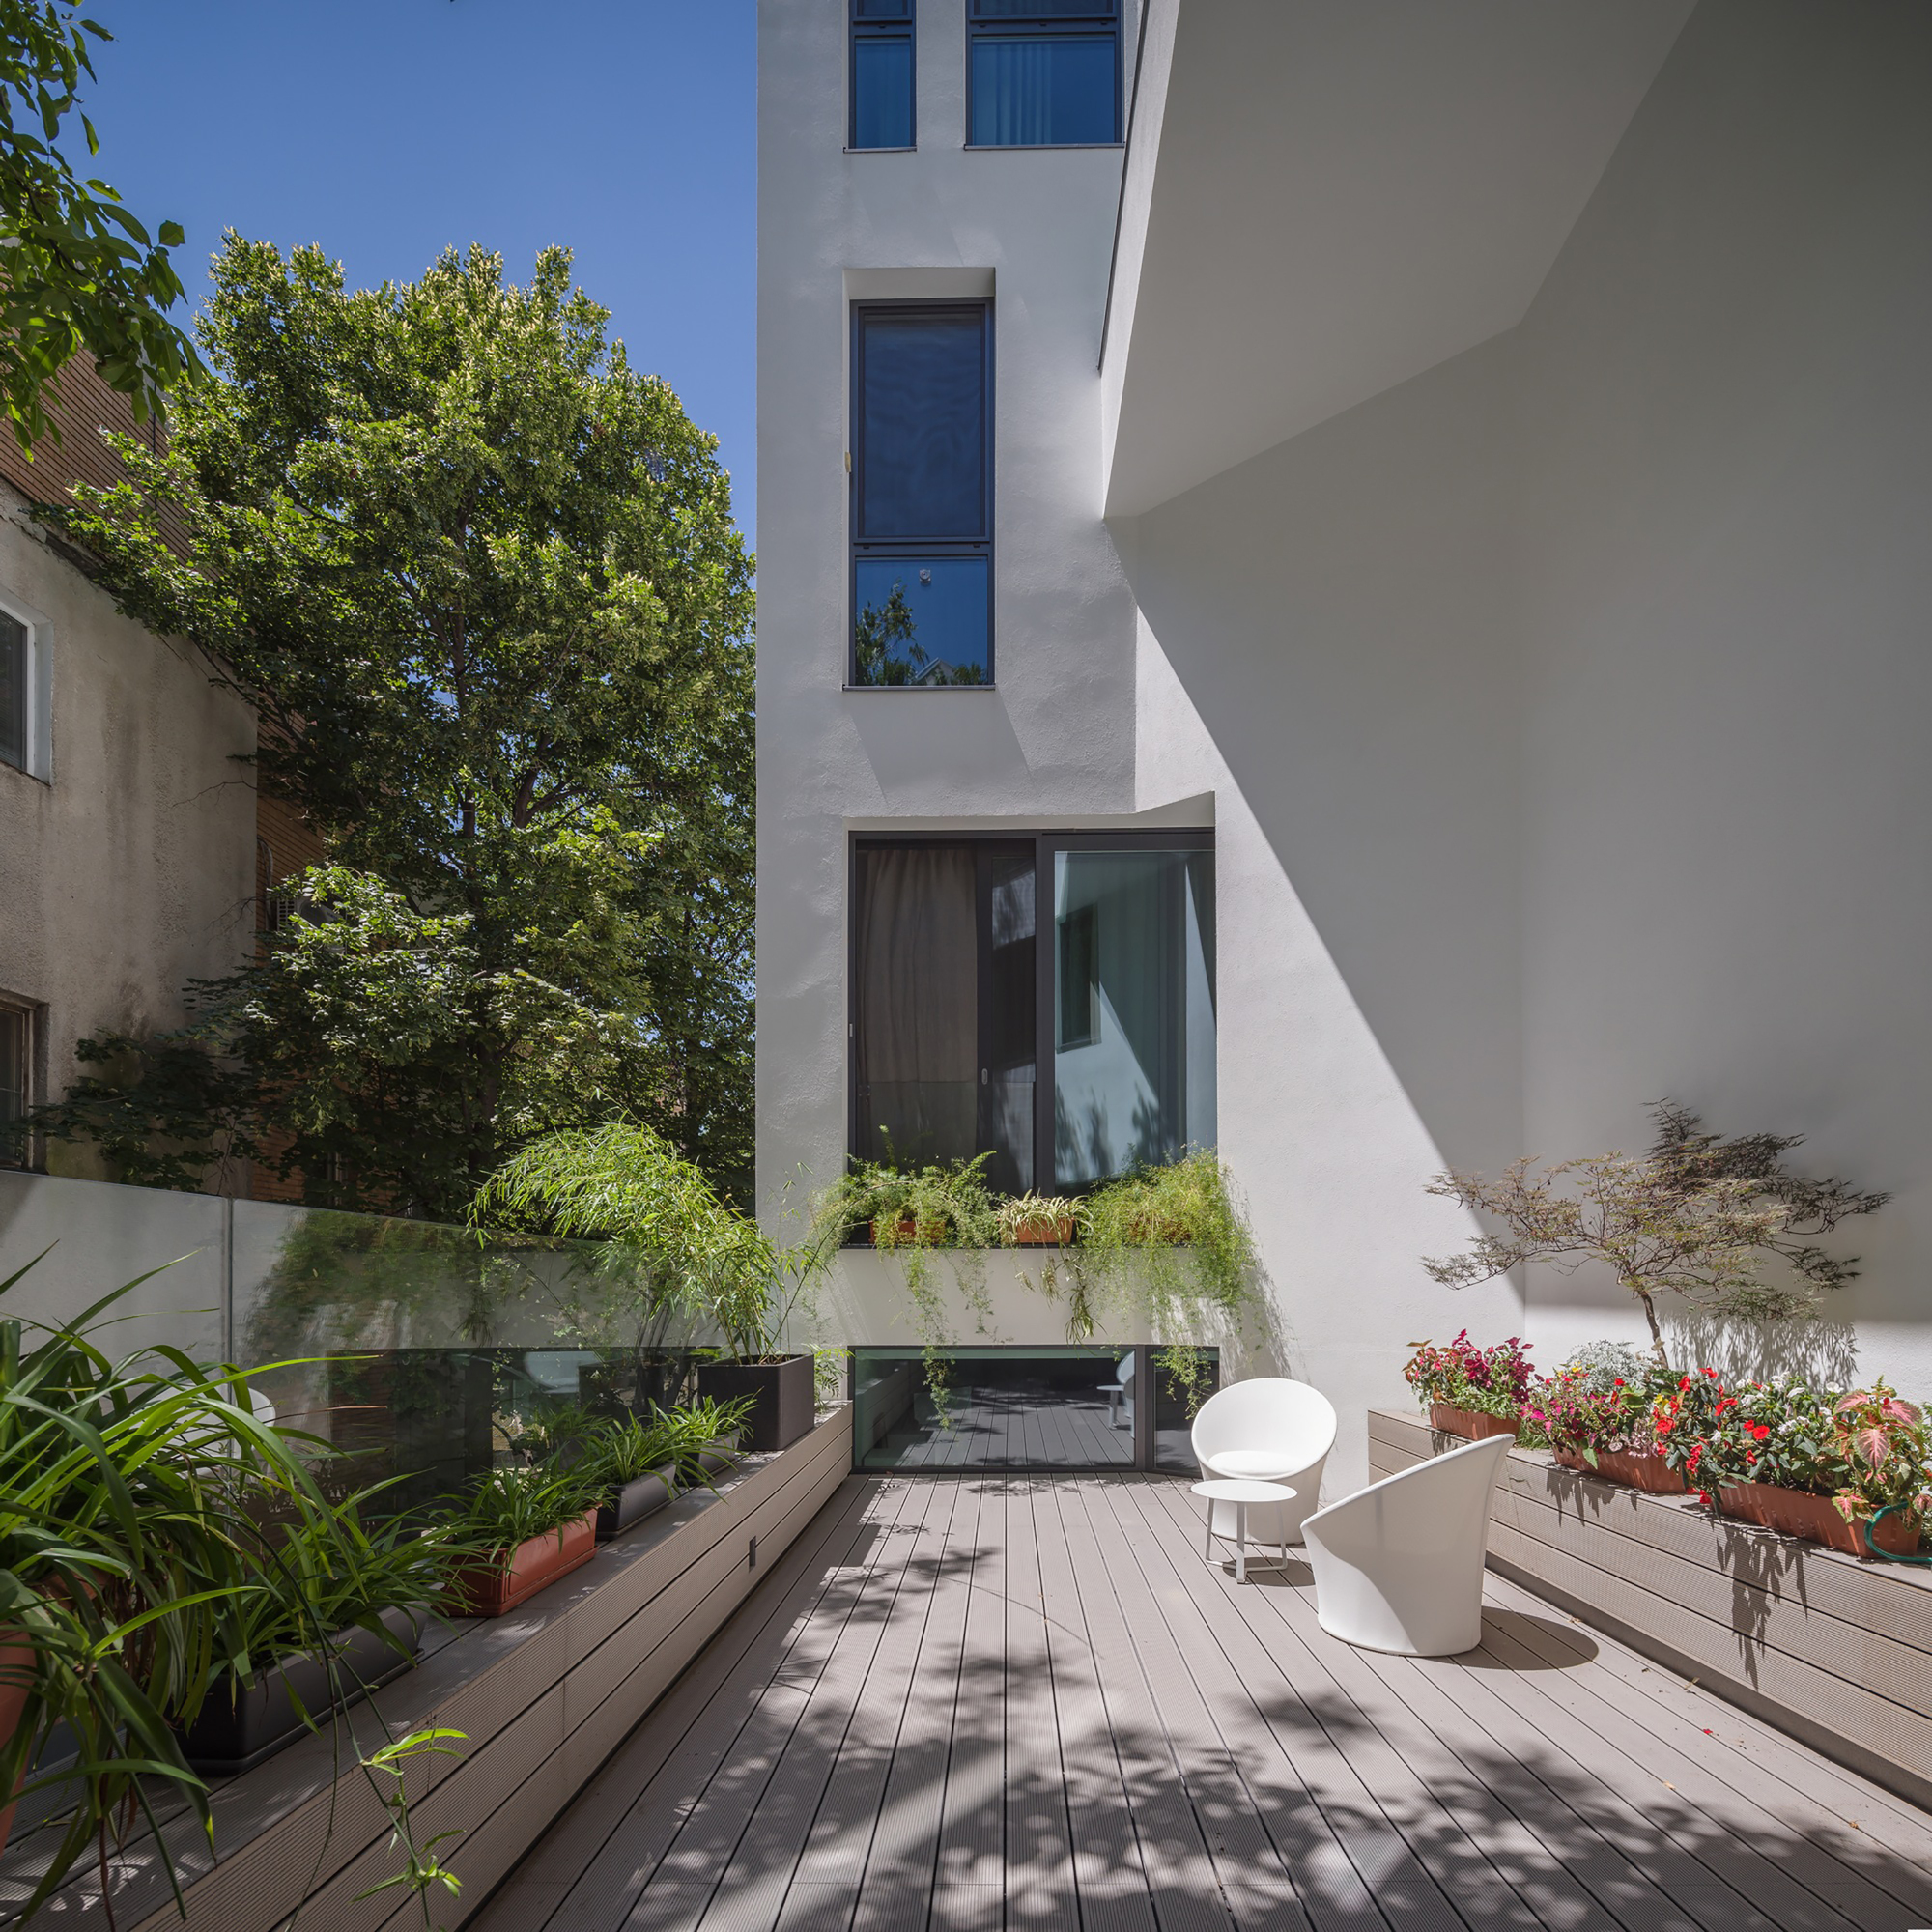 Eco Urban Home In Seattle Washington: Gallery Of Urban Eco House / Tecon Architects